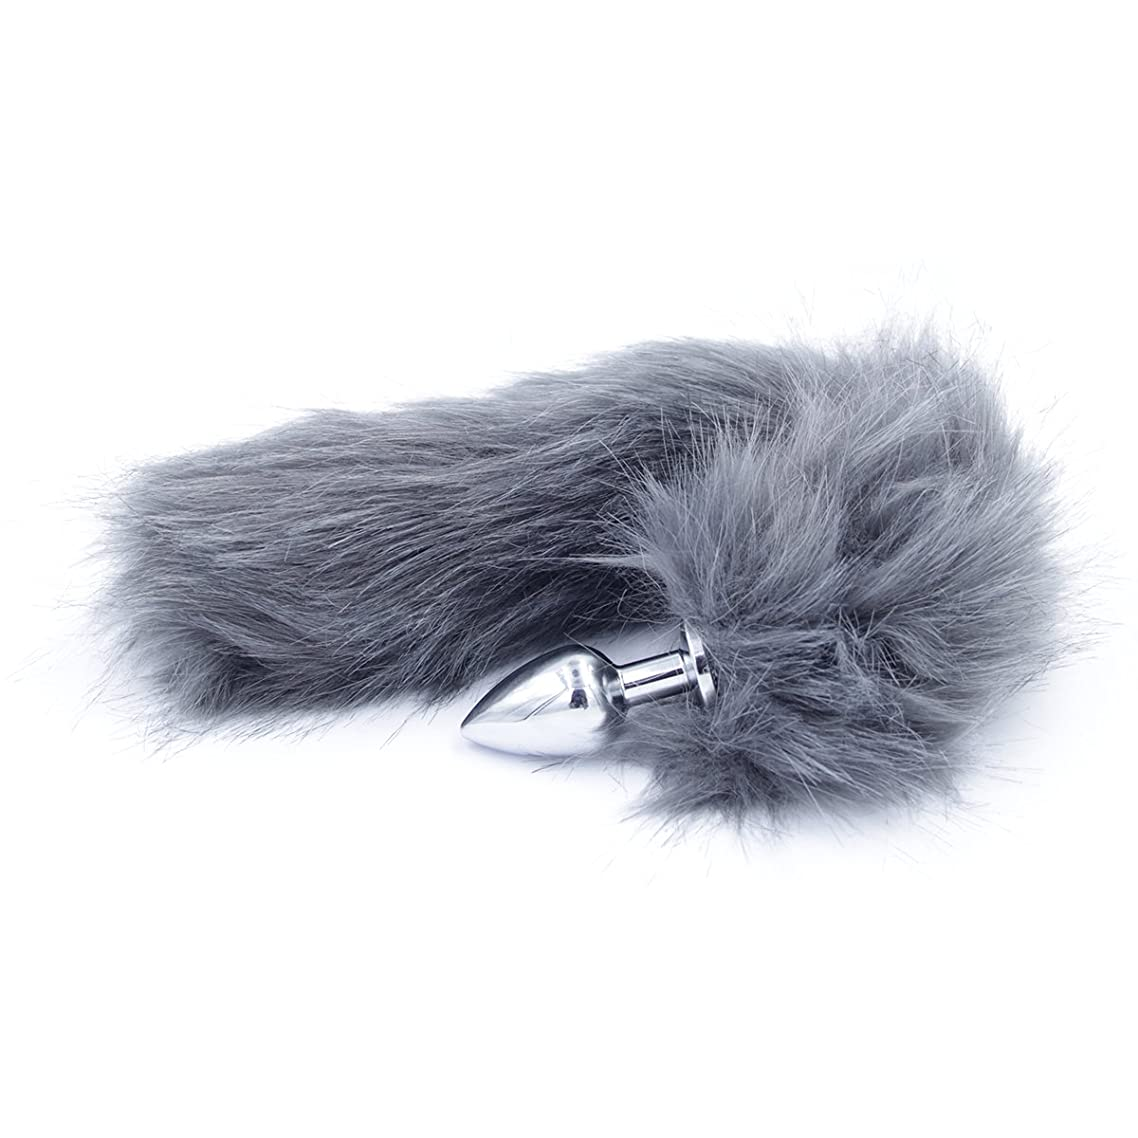 Fox Tail Stainless Steel Ana-l' Plu'g Bu-tt Seee-x to-ys Wand Massage Plush Cosplay Costume Accessories Set Kit Fluffy Shower Enem-a Beginner Starter Set Gray